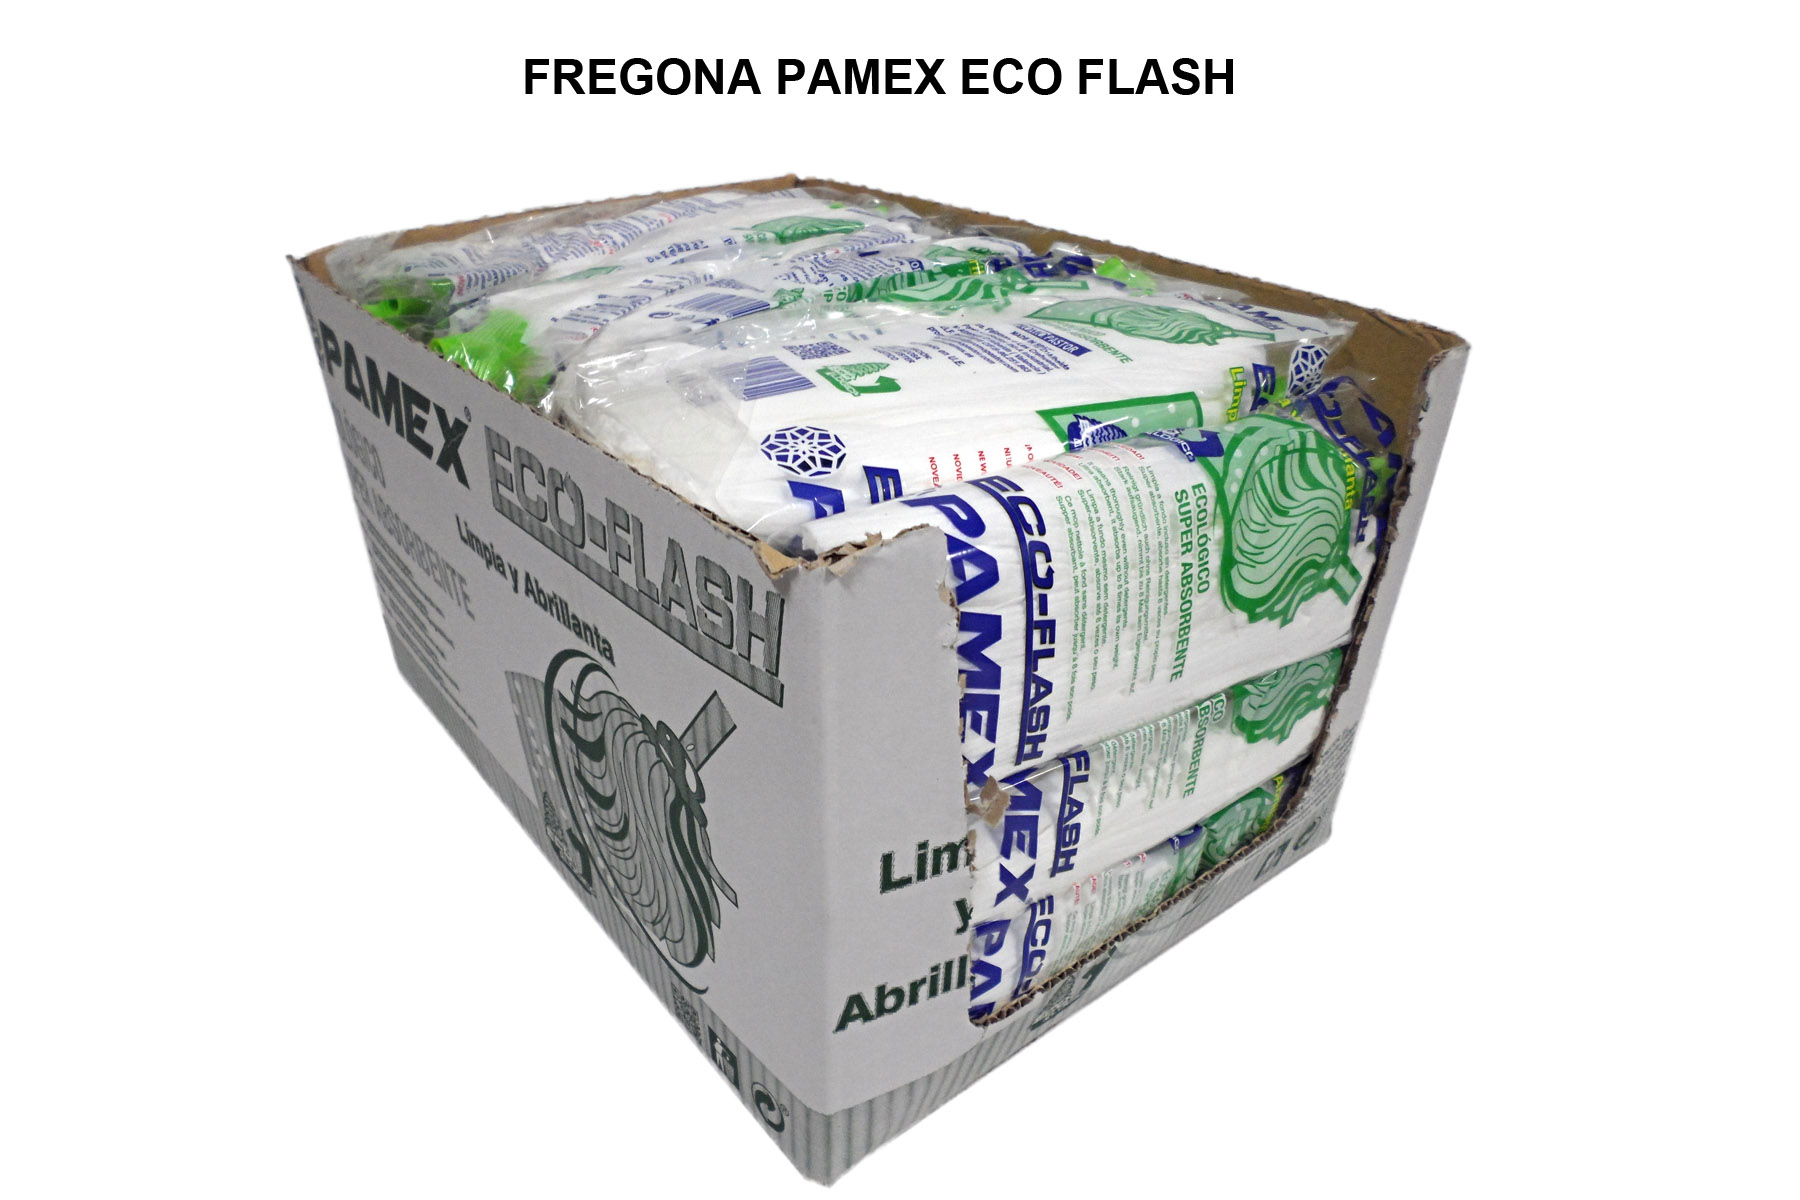 FREGONA PAMEX ECO FLASH